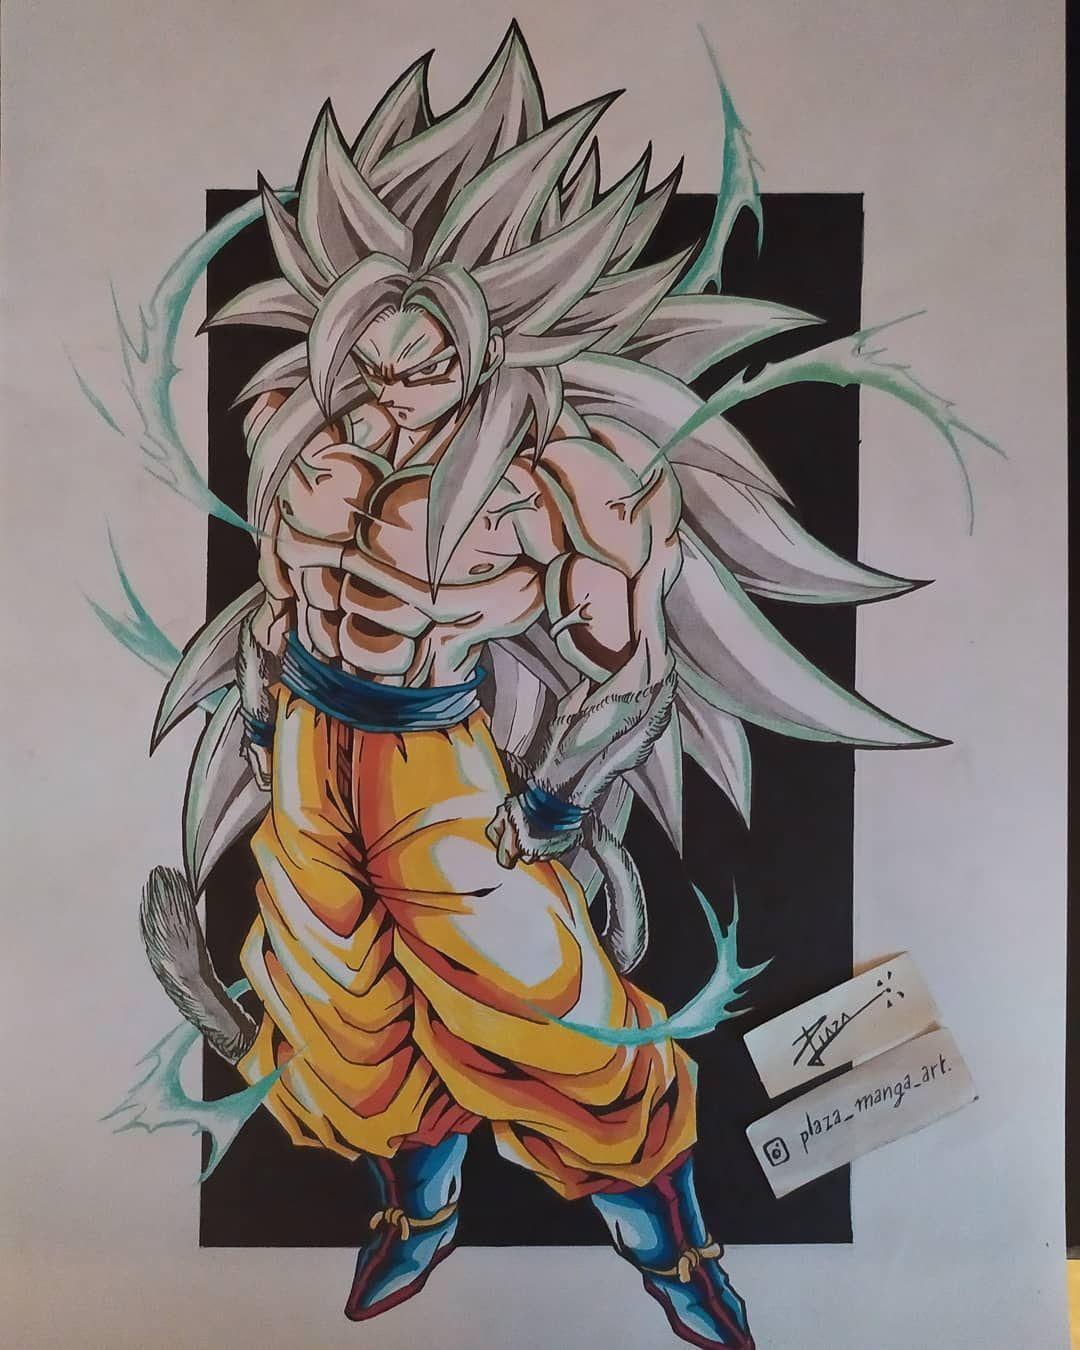 Francisco Tomas Plaza Rey Tren Instagram Goku Ssj4 Ultra Instinto Dragon Ball Art Anime Dragon Ball Super Dragon Ball Artwork